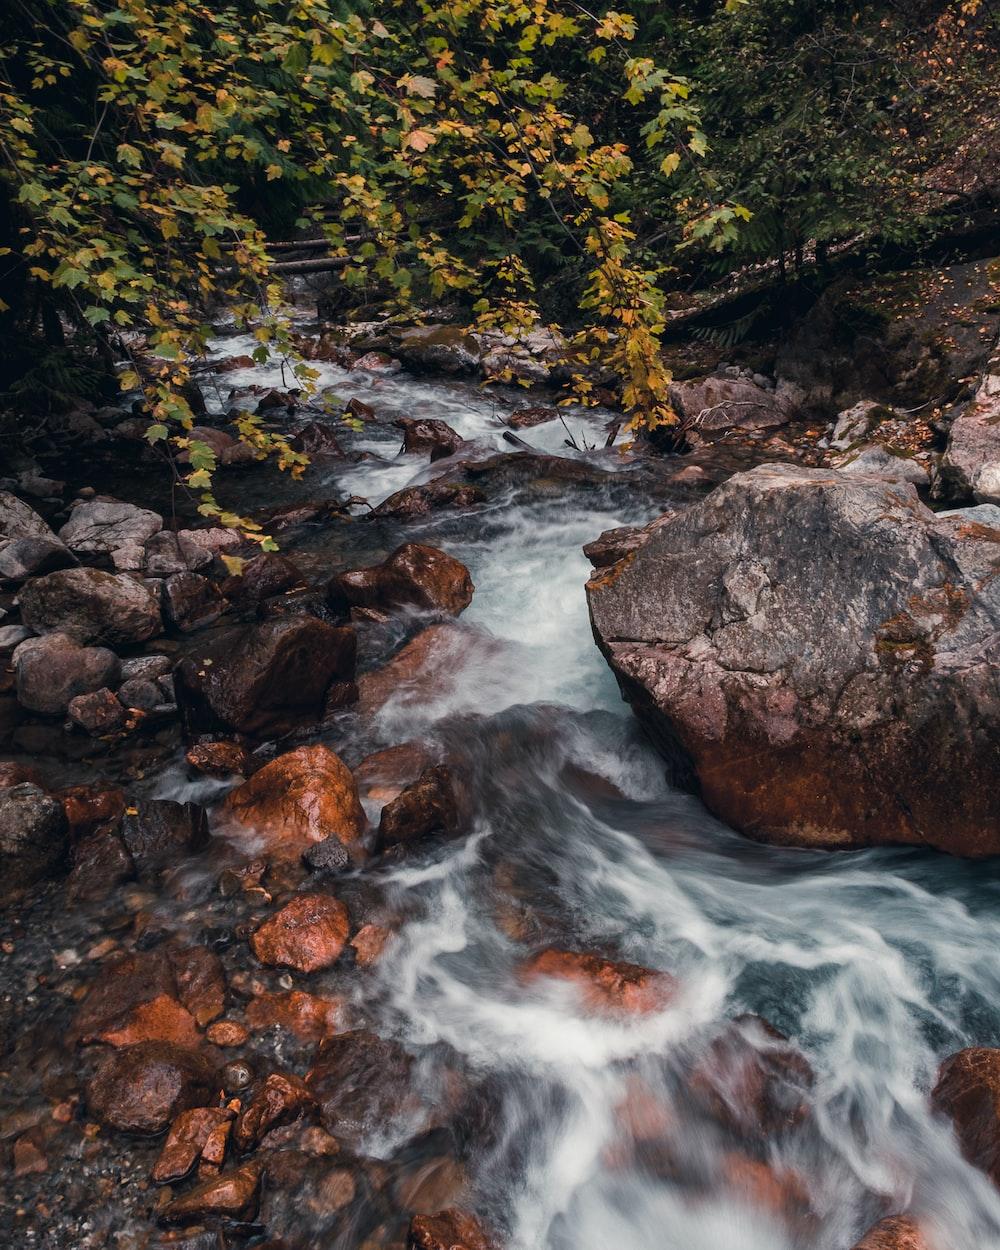 rocks on water stream